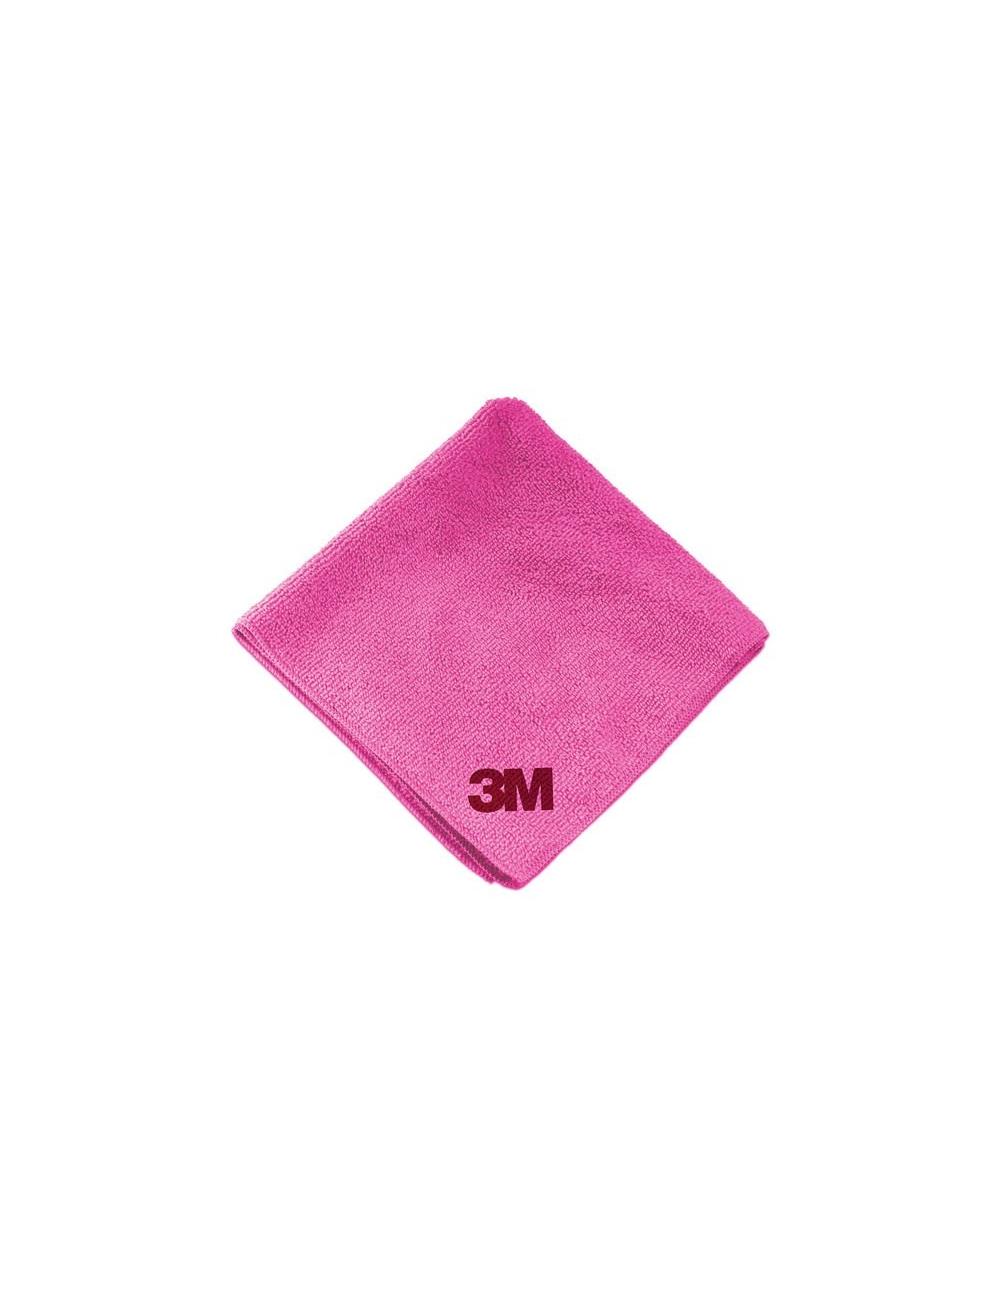 Chiffon de lustrage optimum rose/rouge 3M 360x320mm